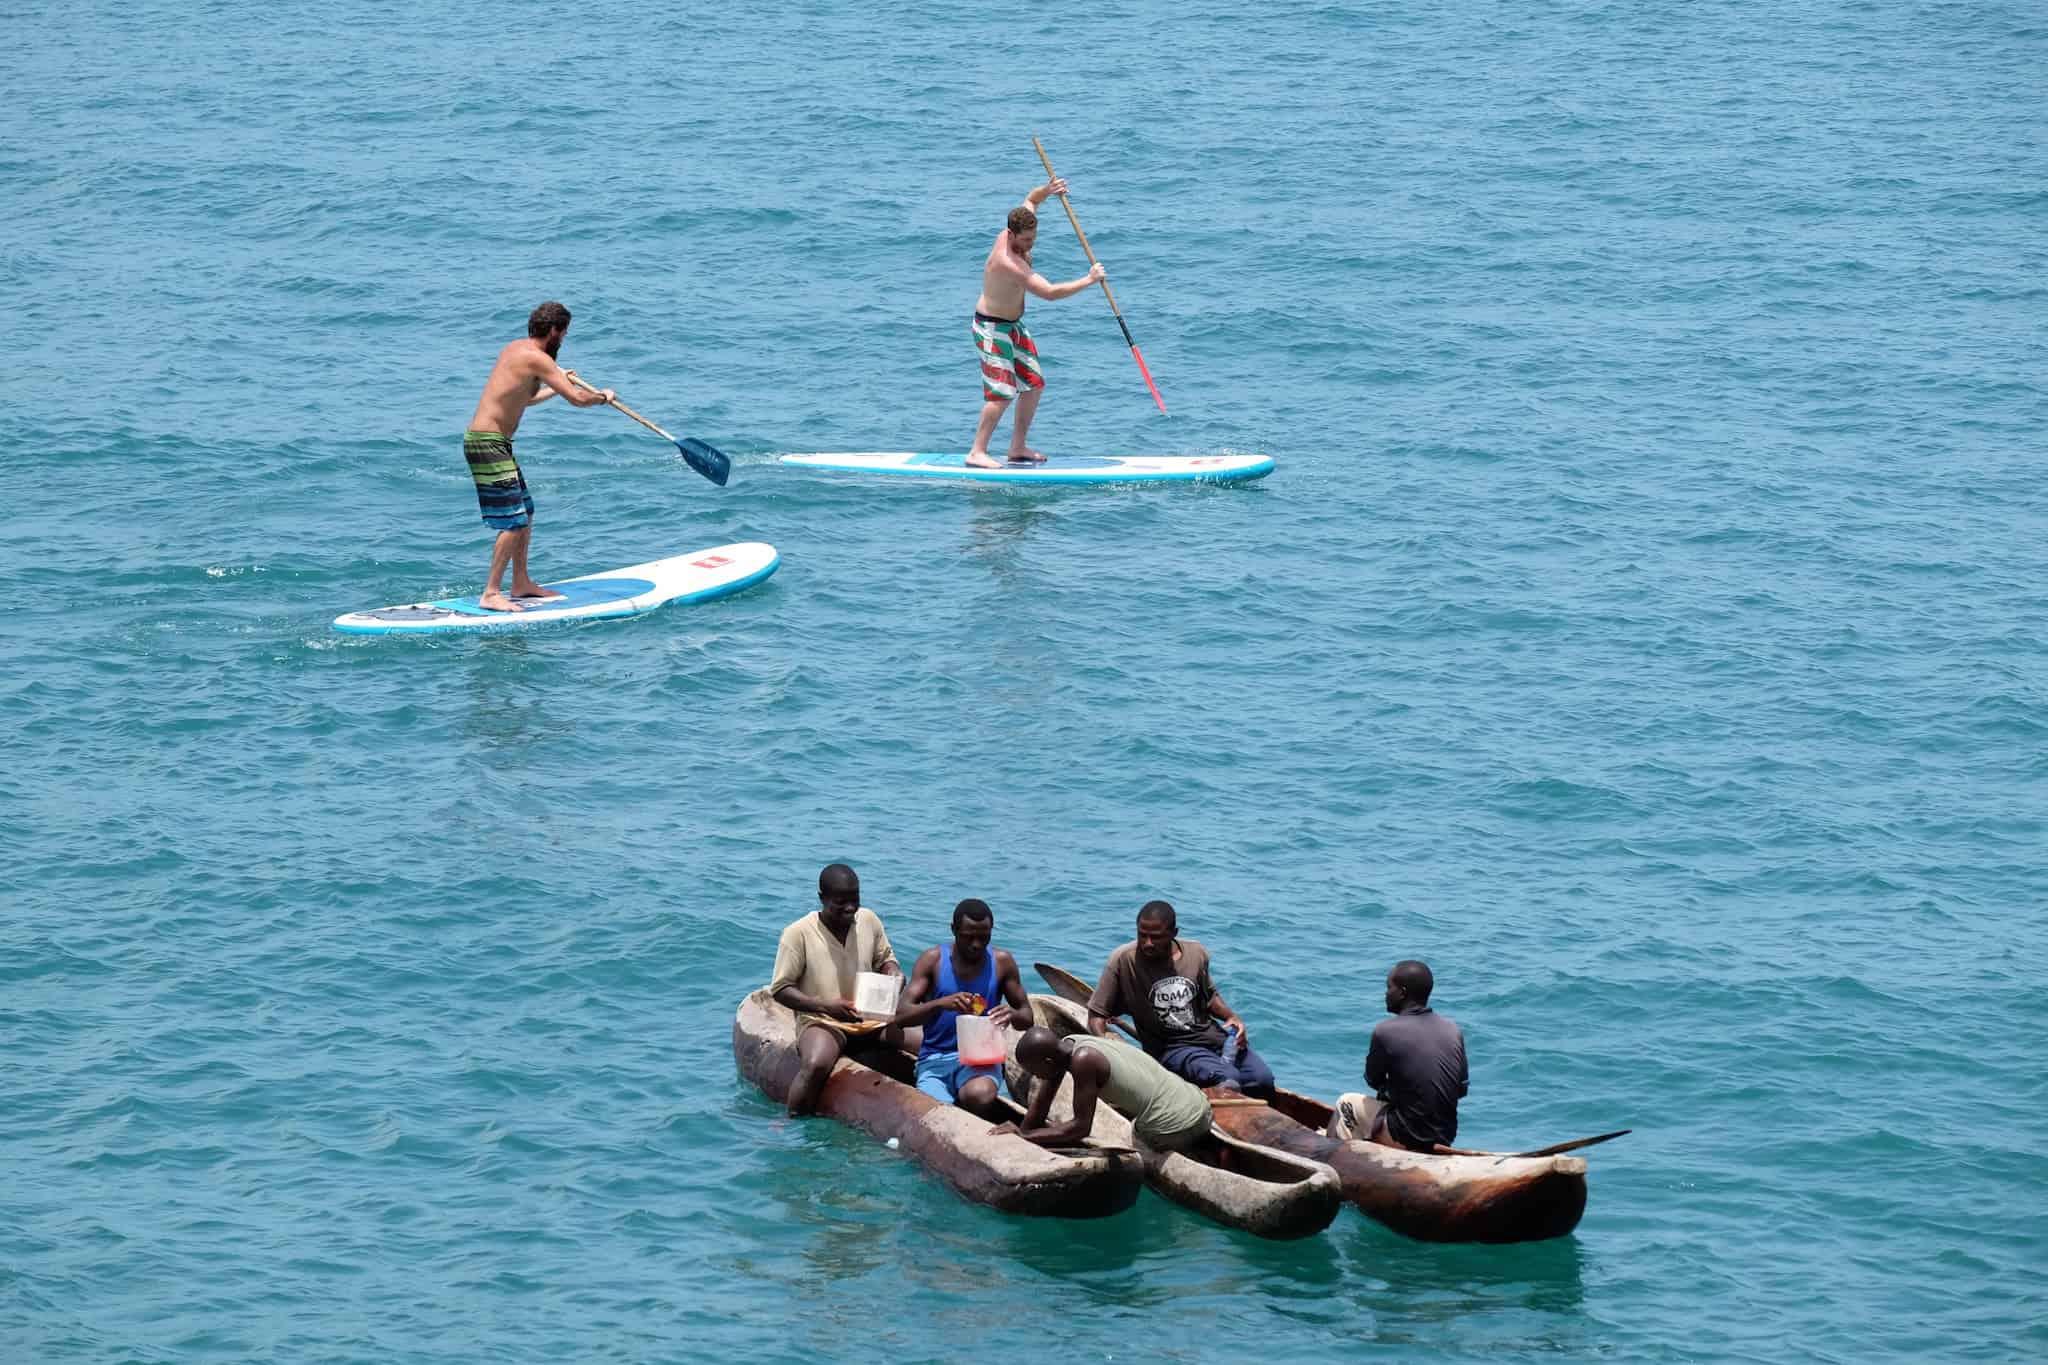 SUP in Malawi